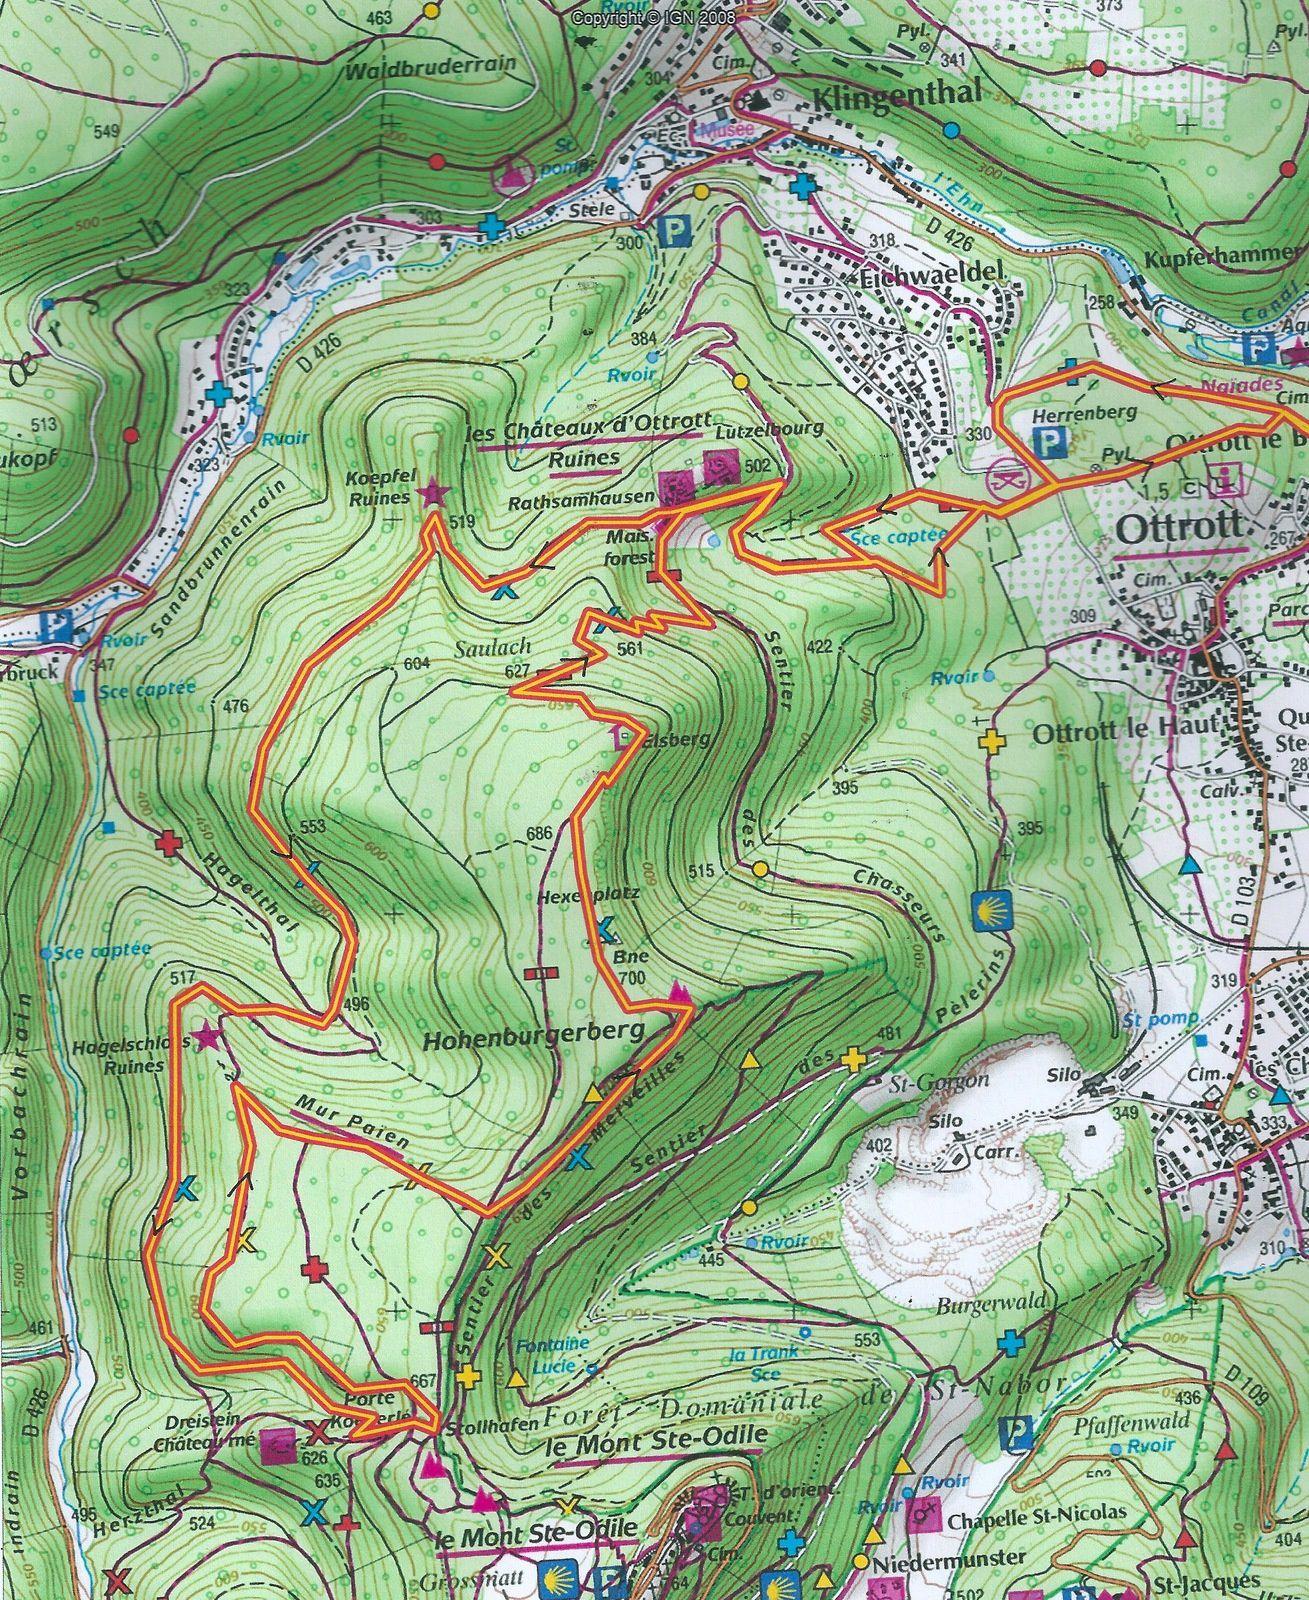 VTT autour d'Obernai - 28 septembre 2014